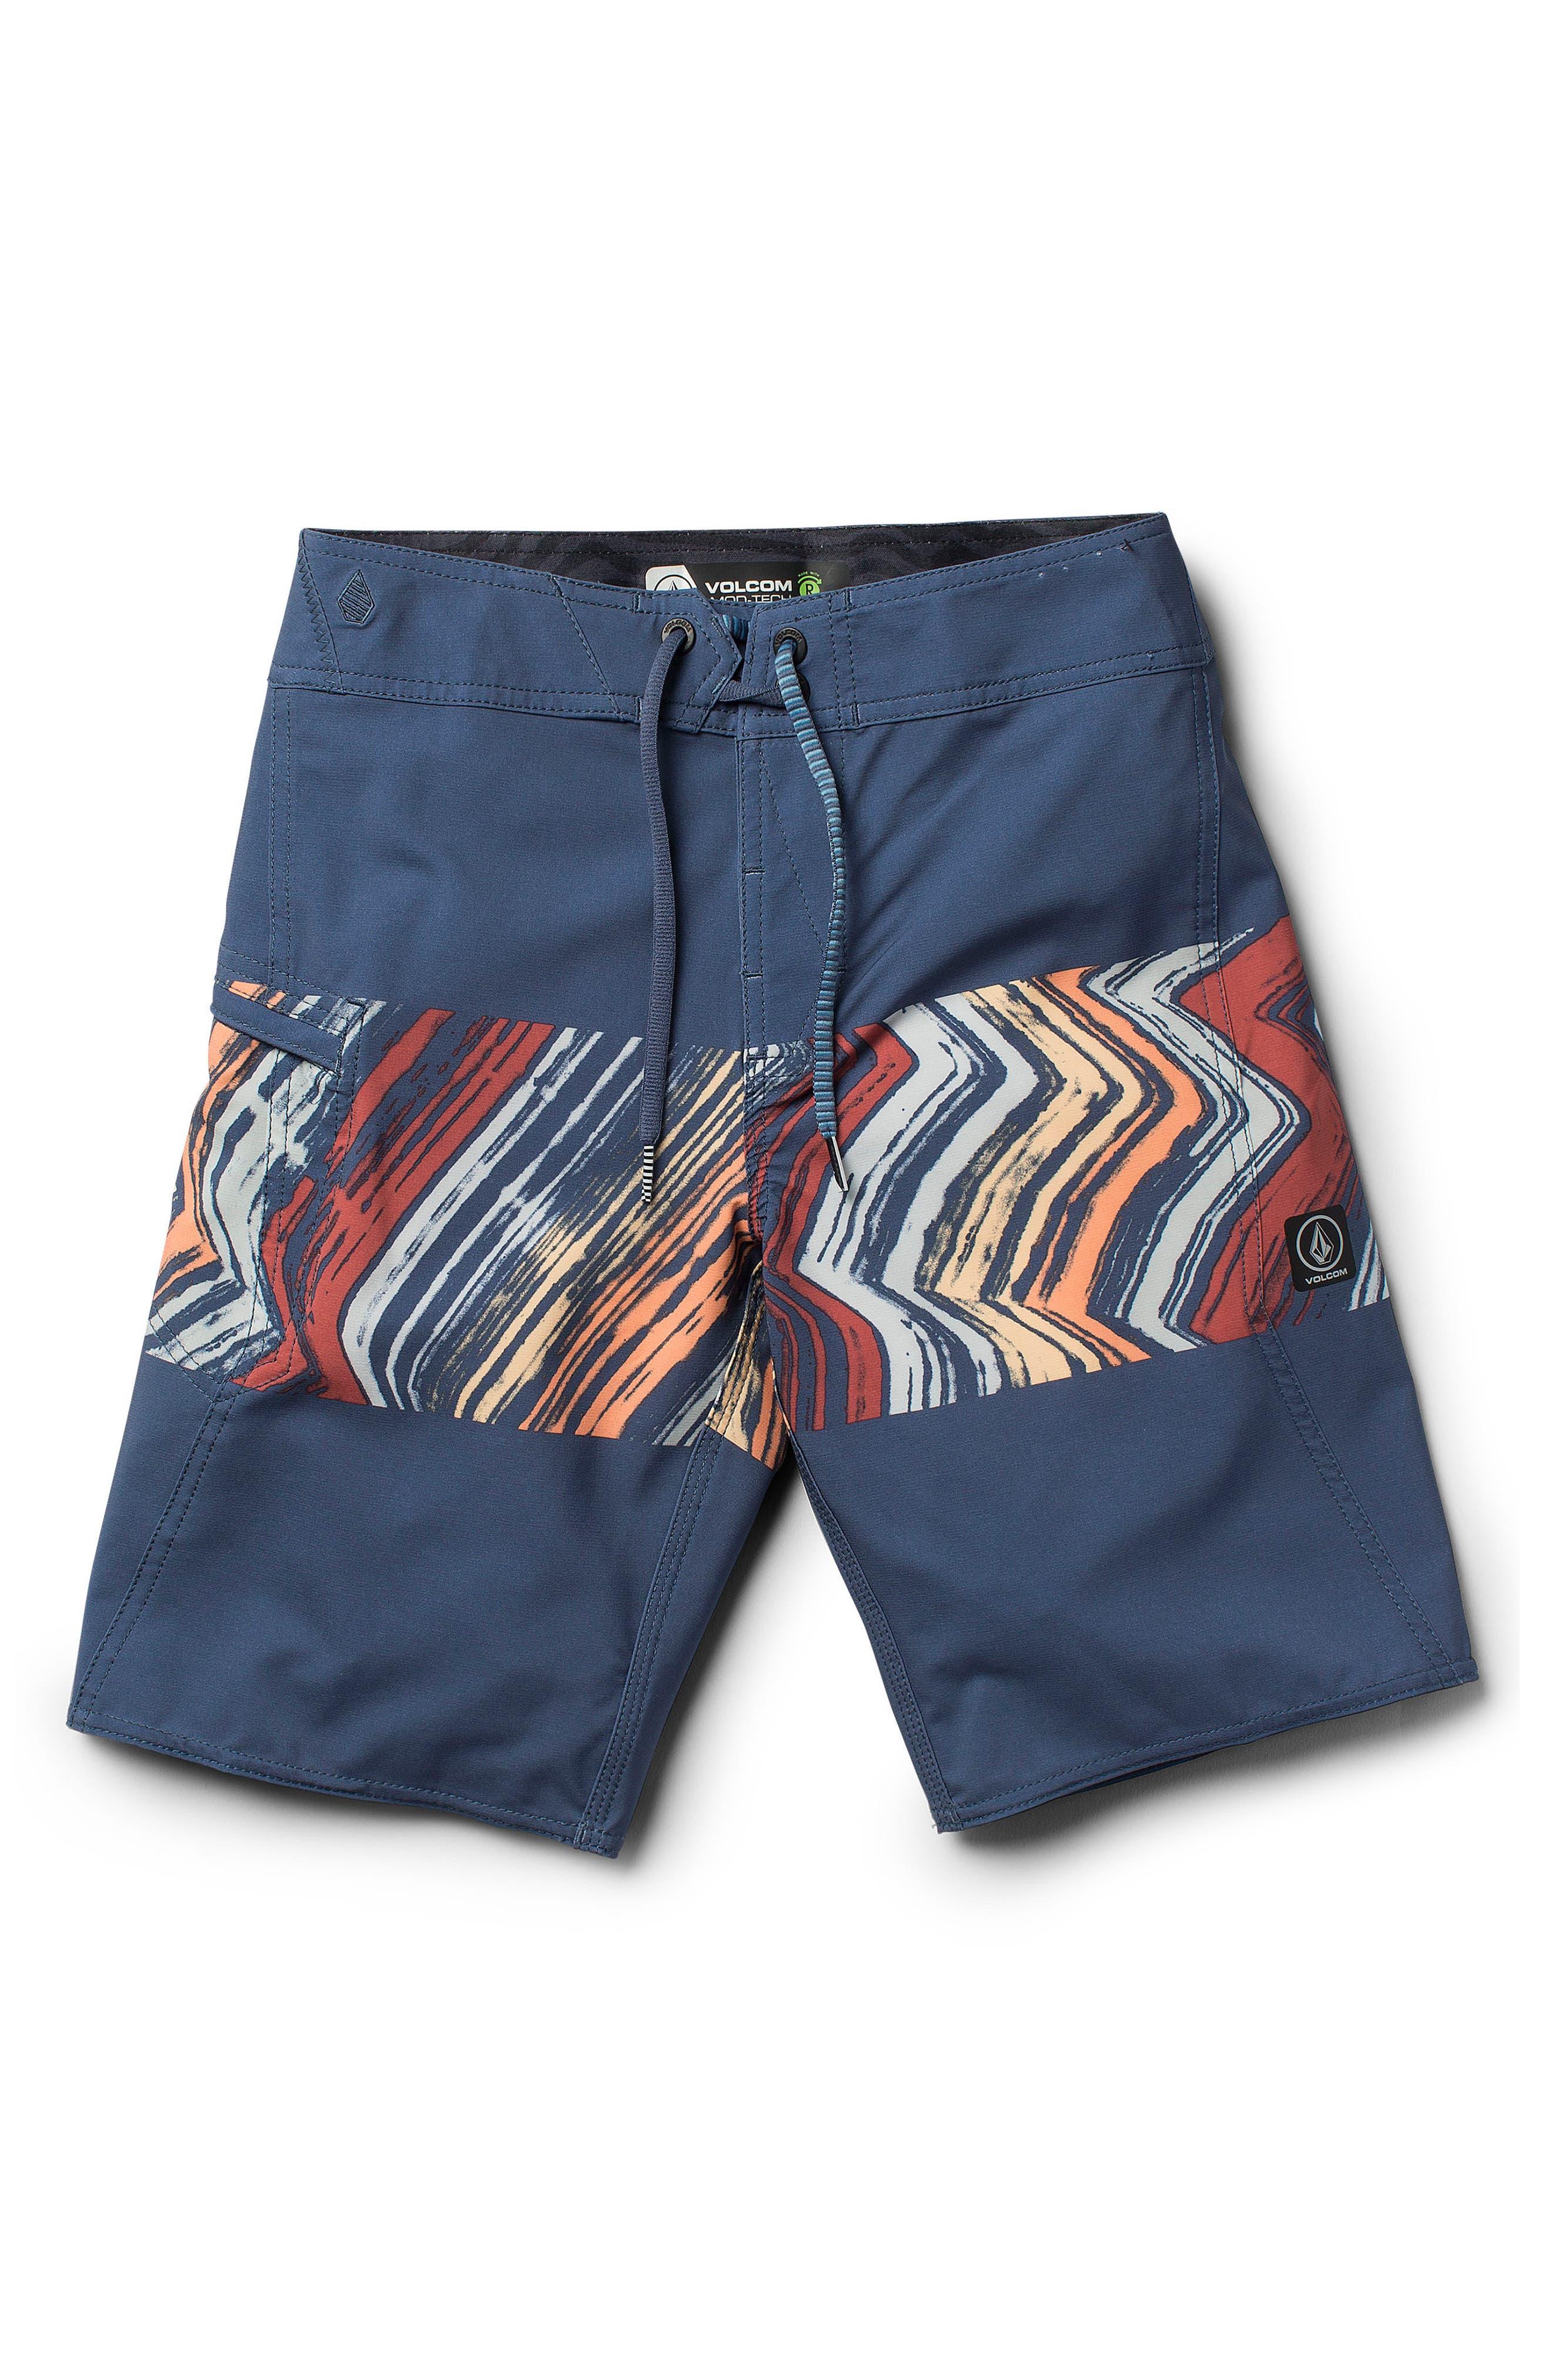 Macaw Board Shorts,                             Main thumbnail 1, color,                             Sunburst